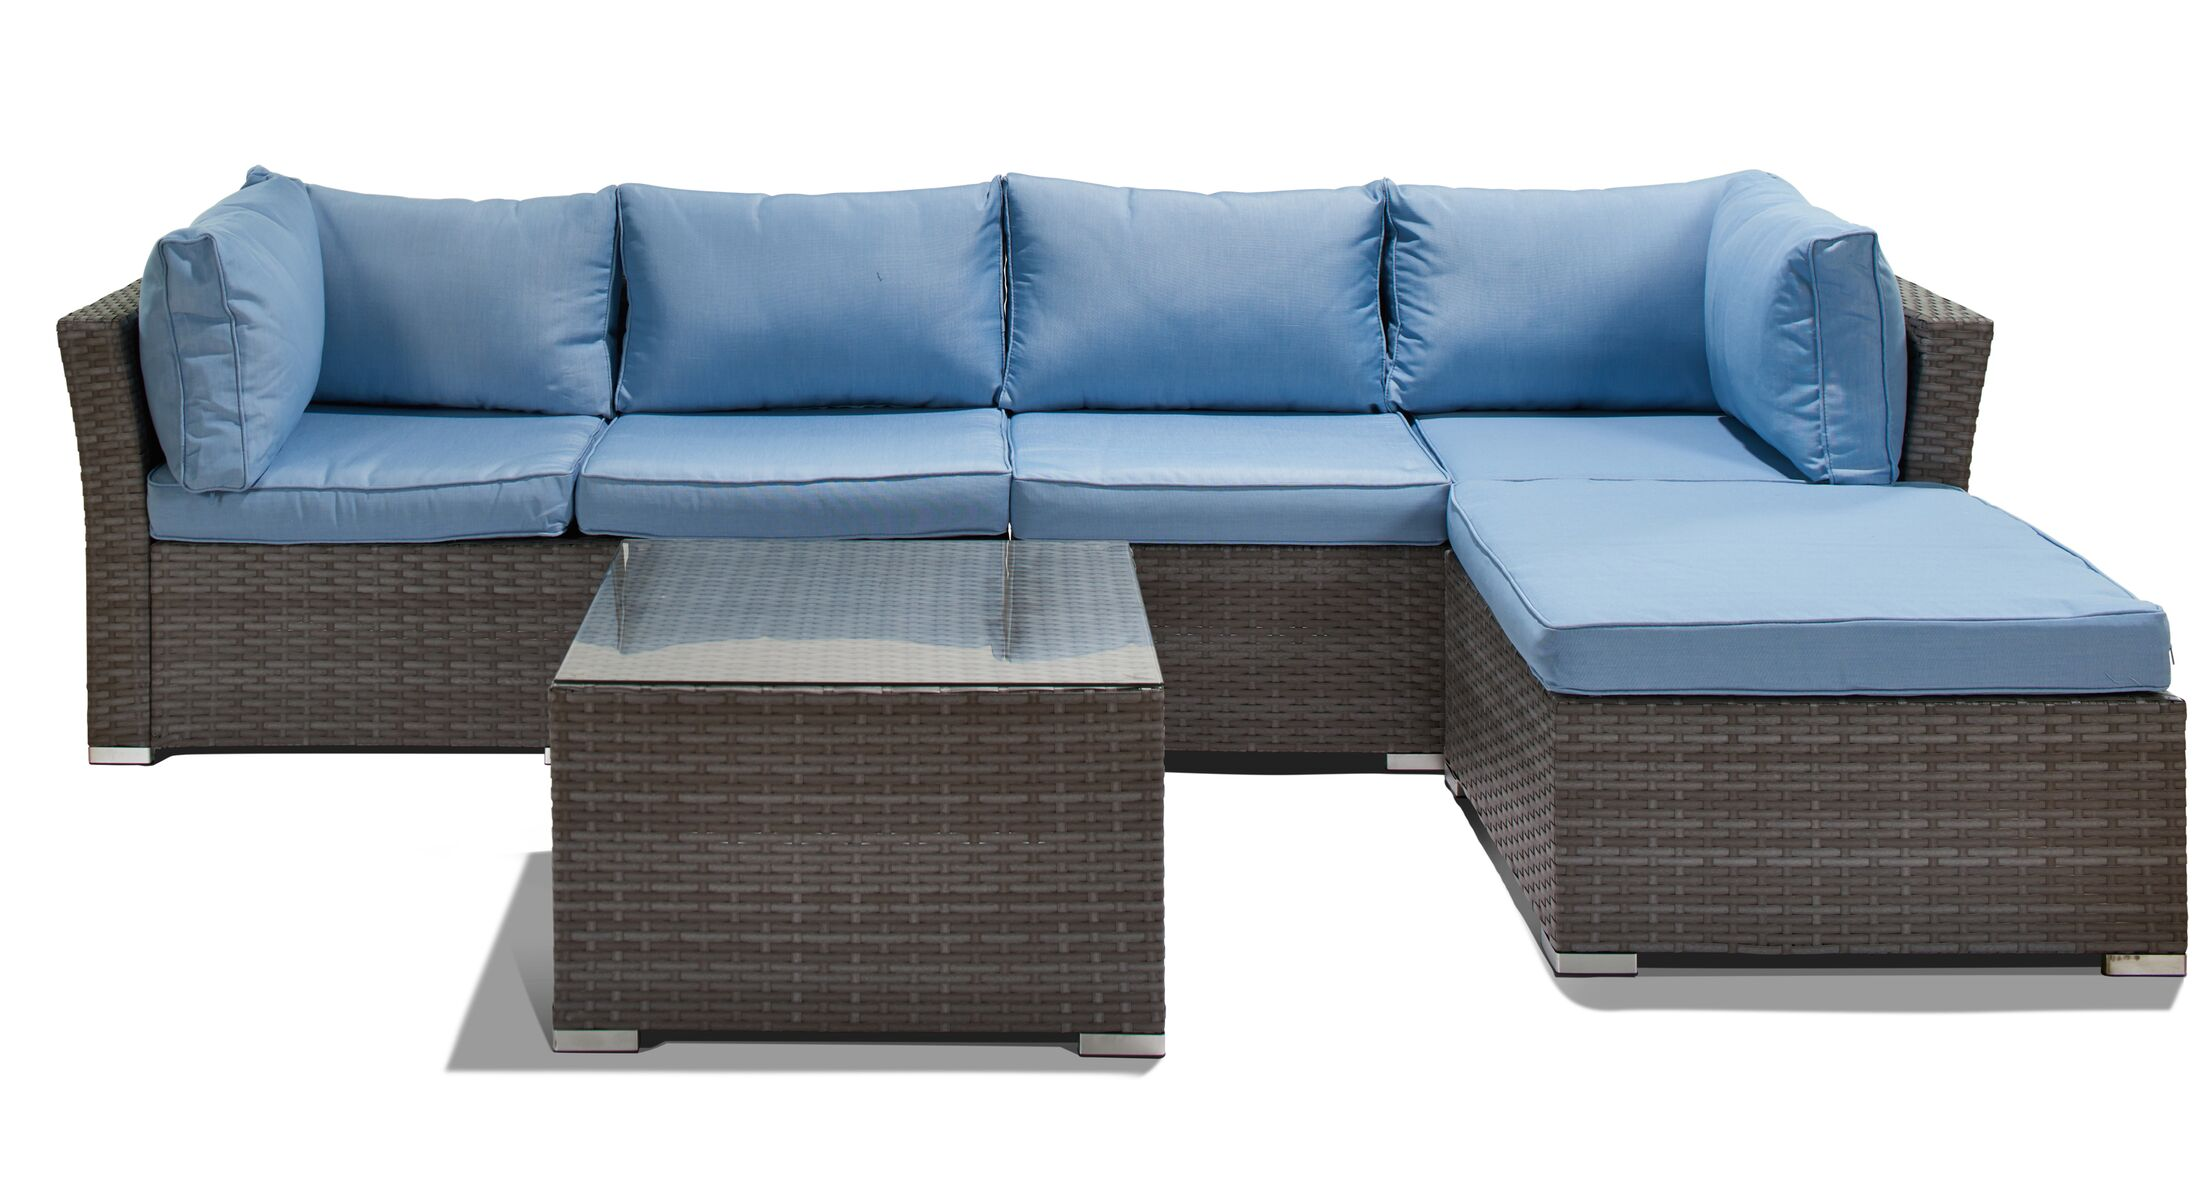 Galdamez 5 Piece Rattan Sofa Seating Group